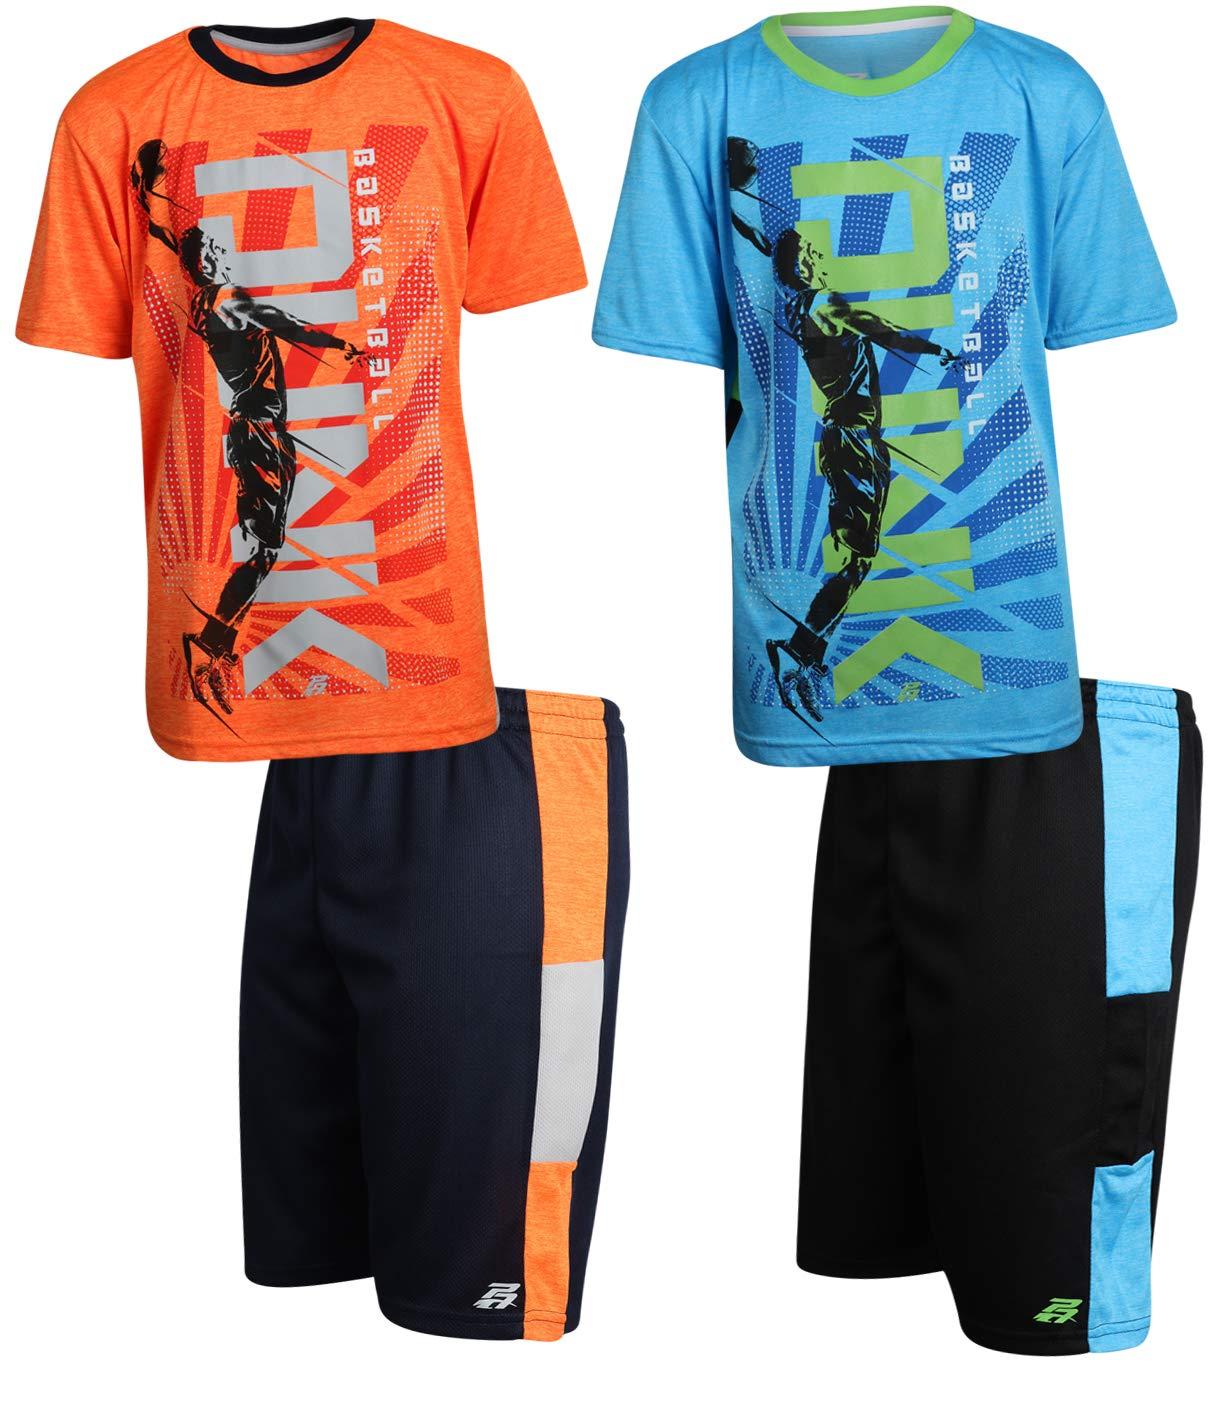 Pro Athlete Boys 4-Piece Matching Performance Basketball Shirt and Short Sets, Dunk, Size 5/6'